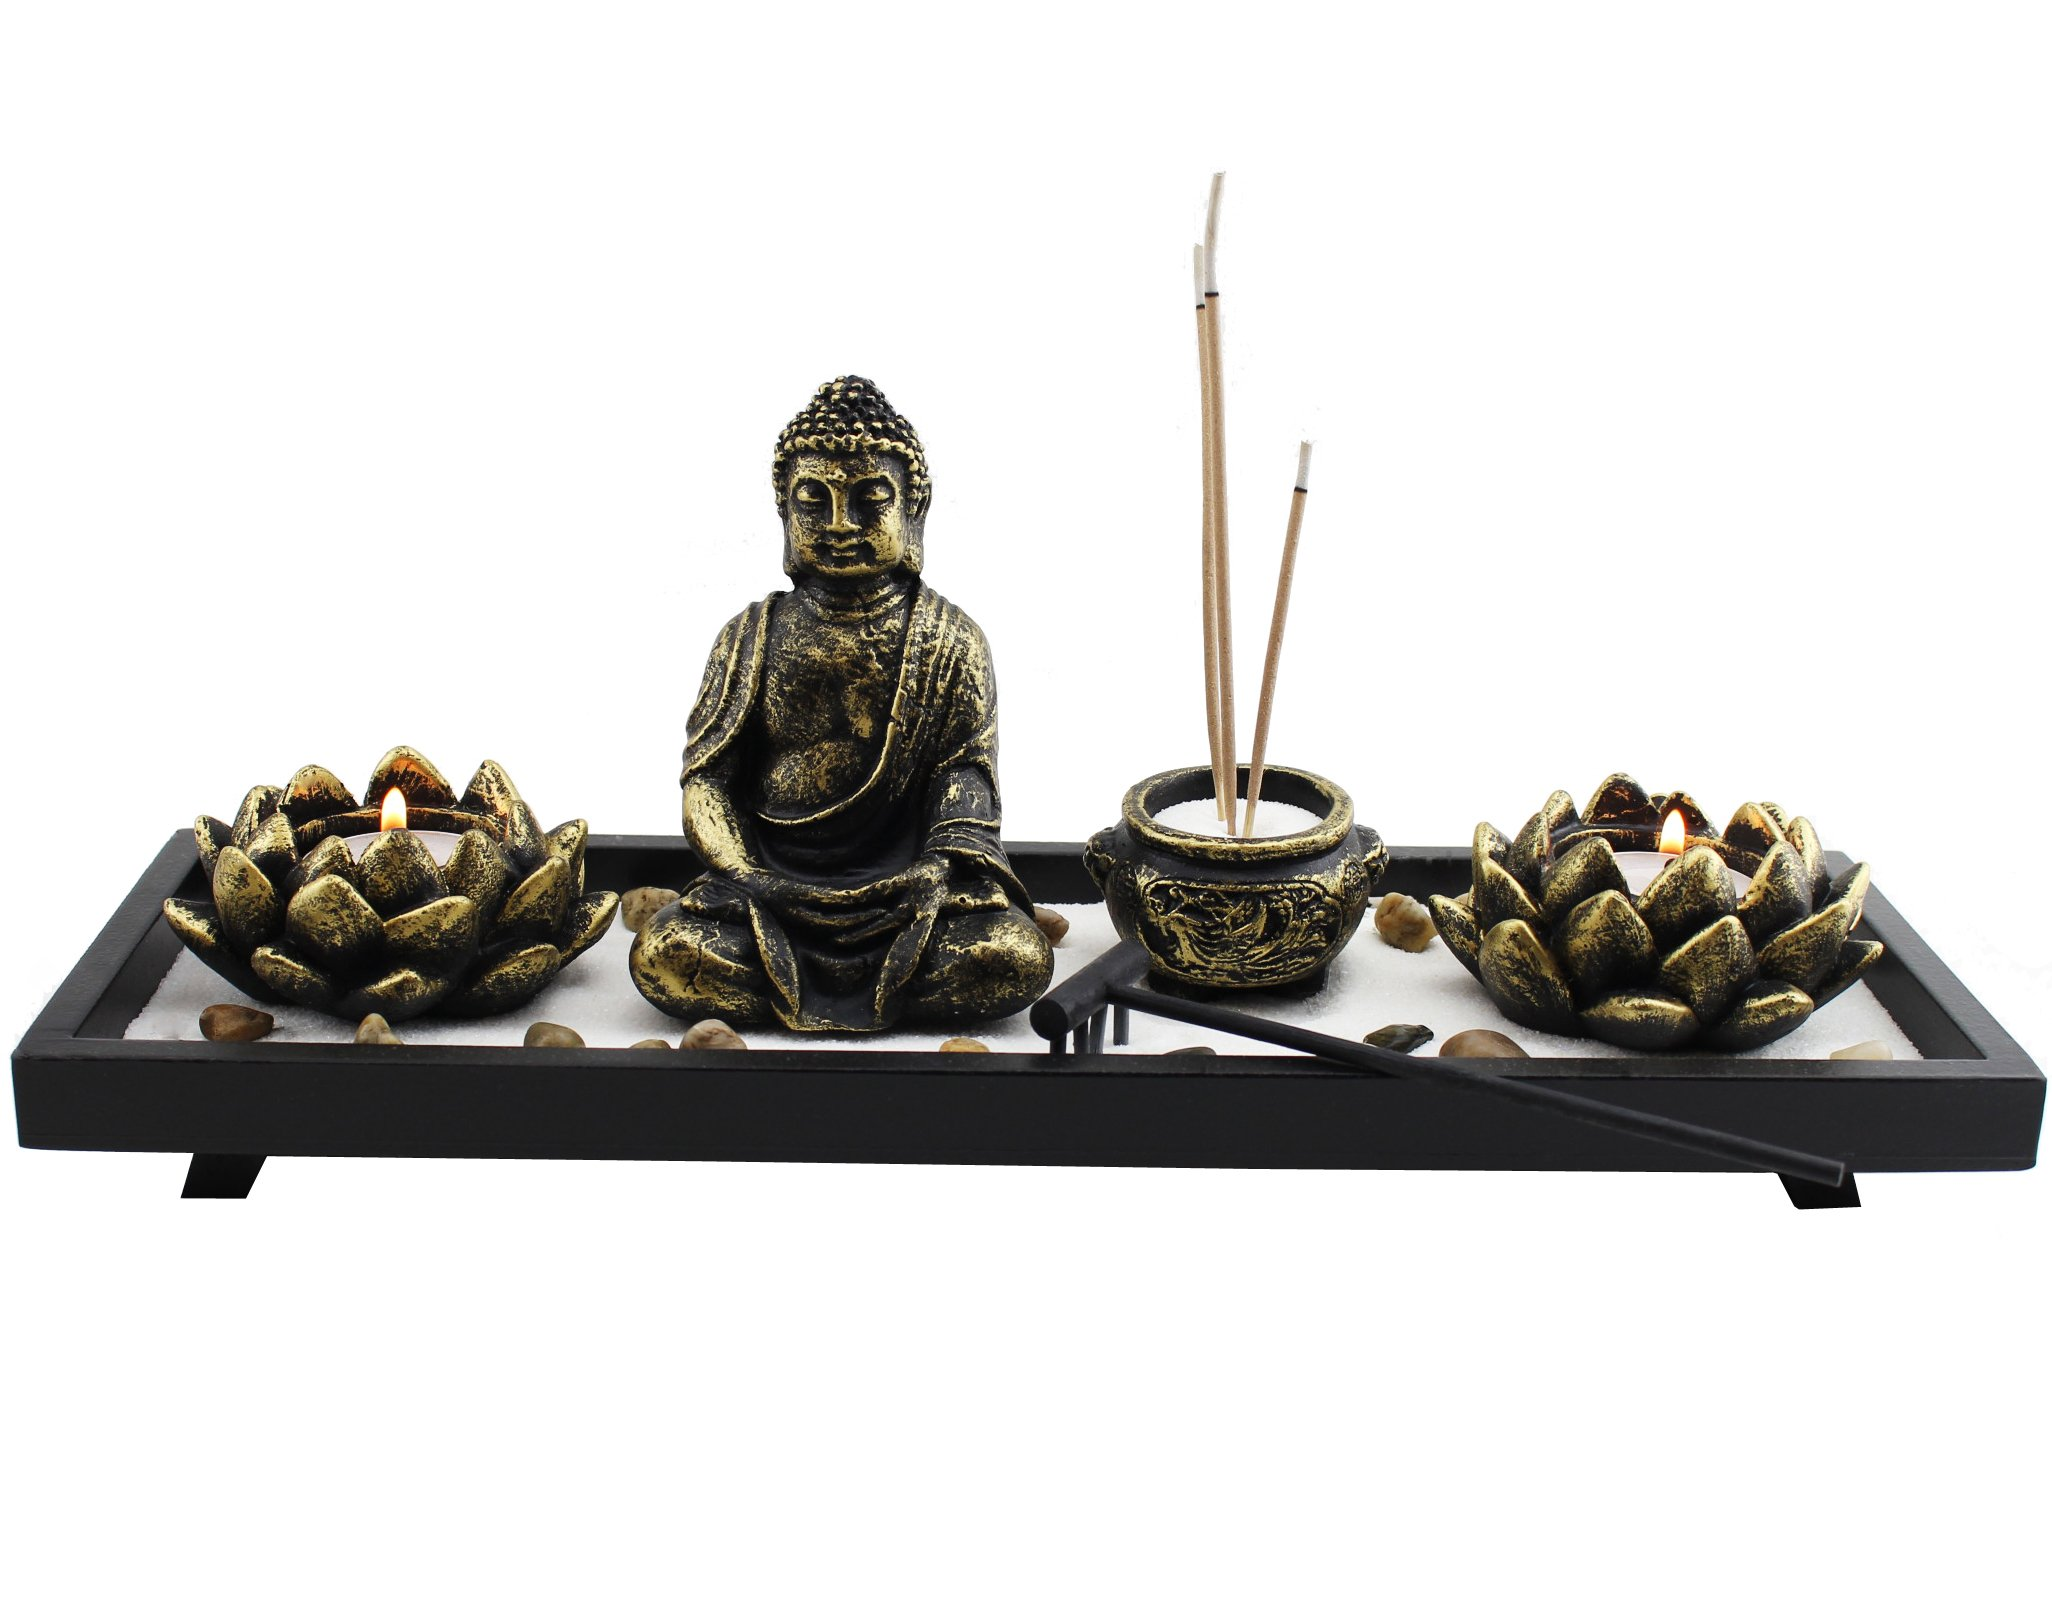 Feng Shui Tabletop Zen Garden Buddha Rock Rake Sand Candle Incense Burner Home Decor Gift (KT00034) ~ We Pay Your Sales Tax